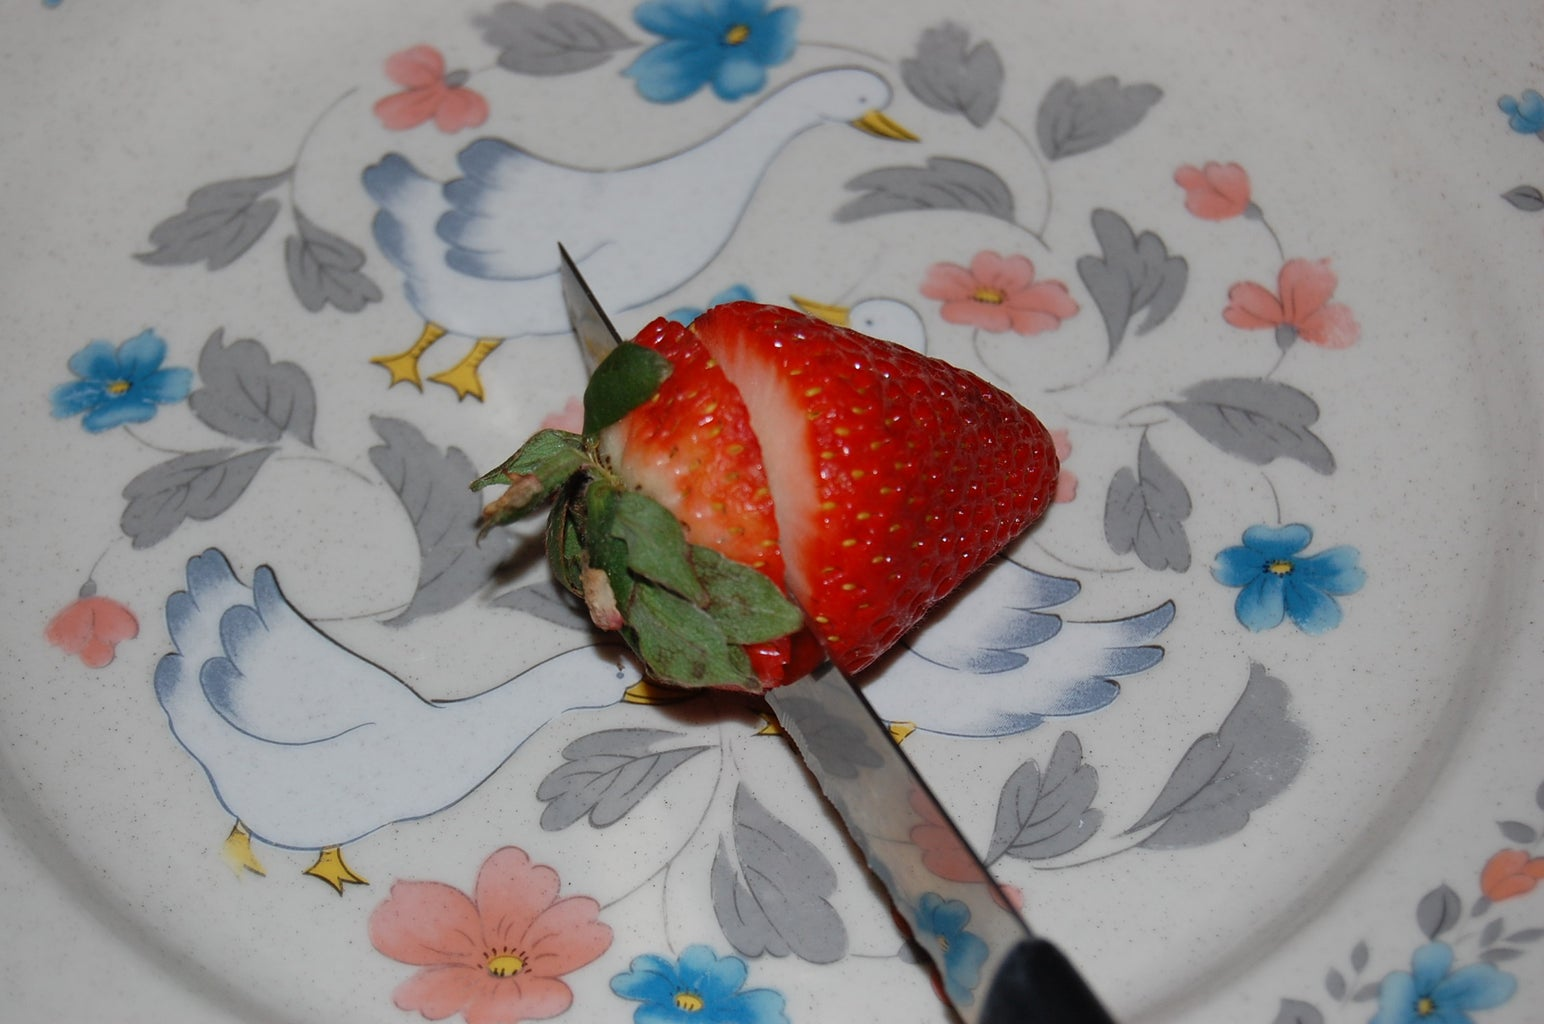 Macerate the Strawberries